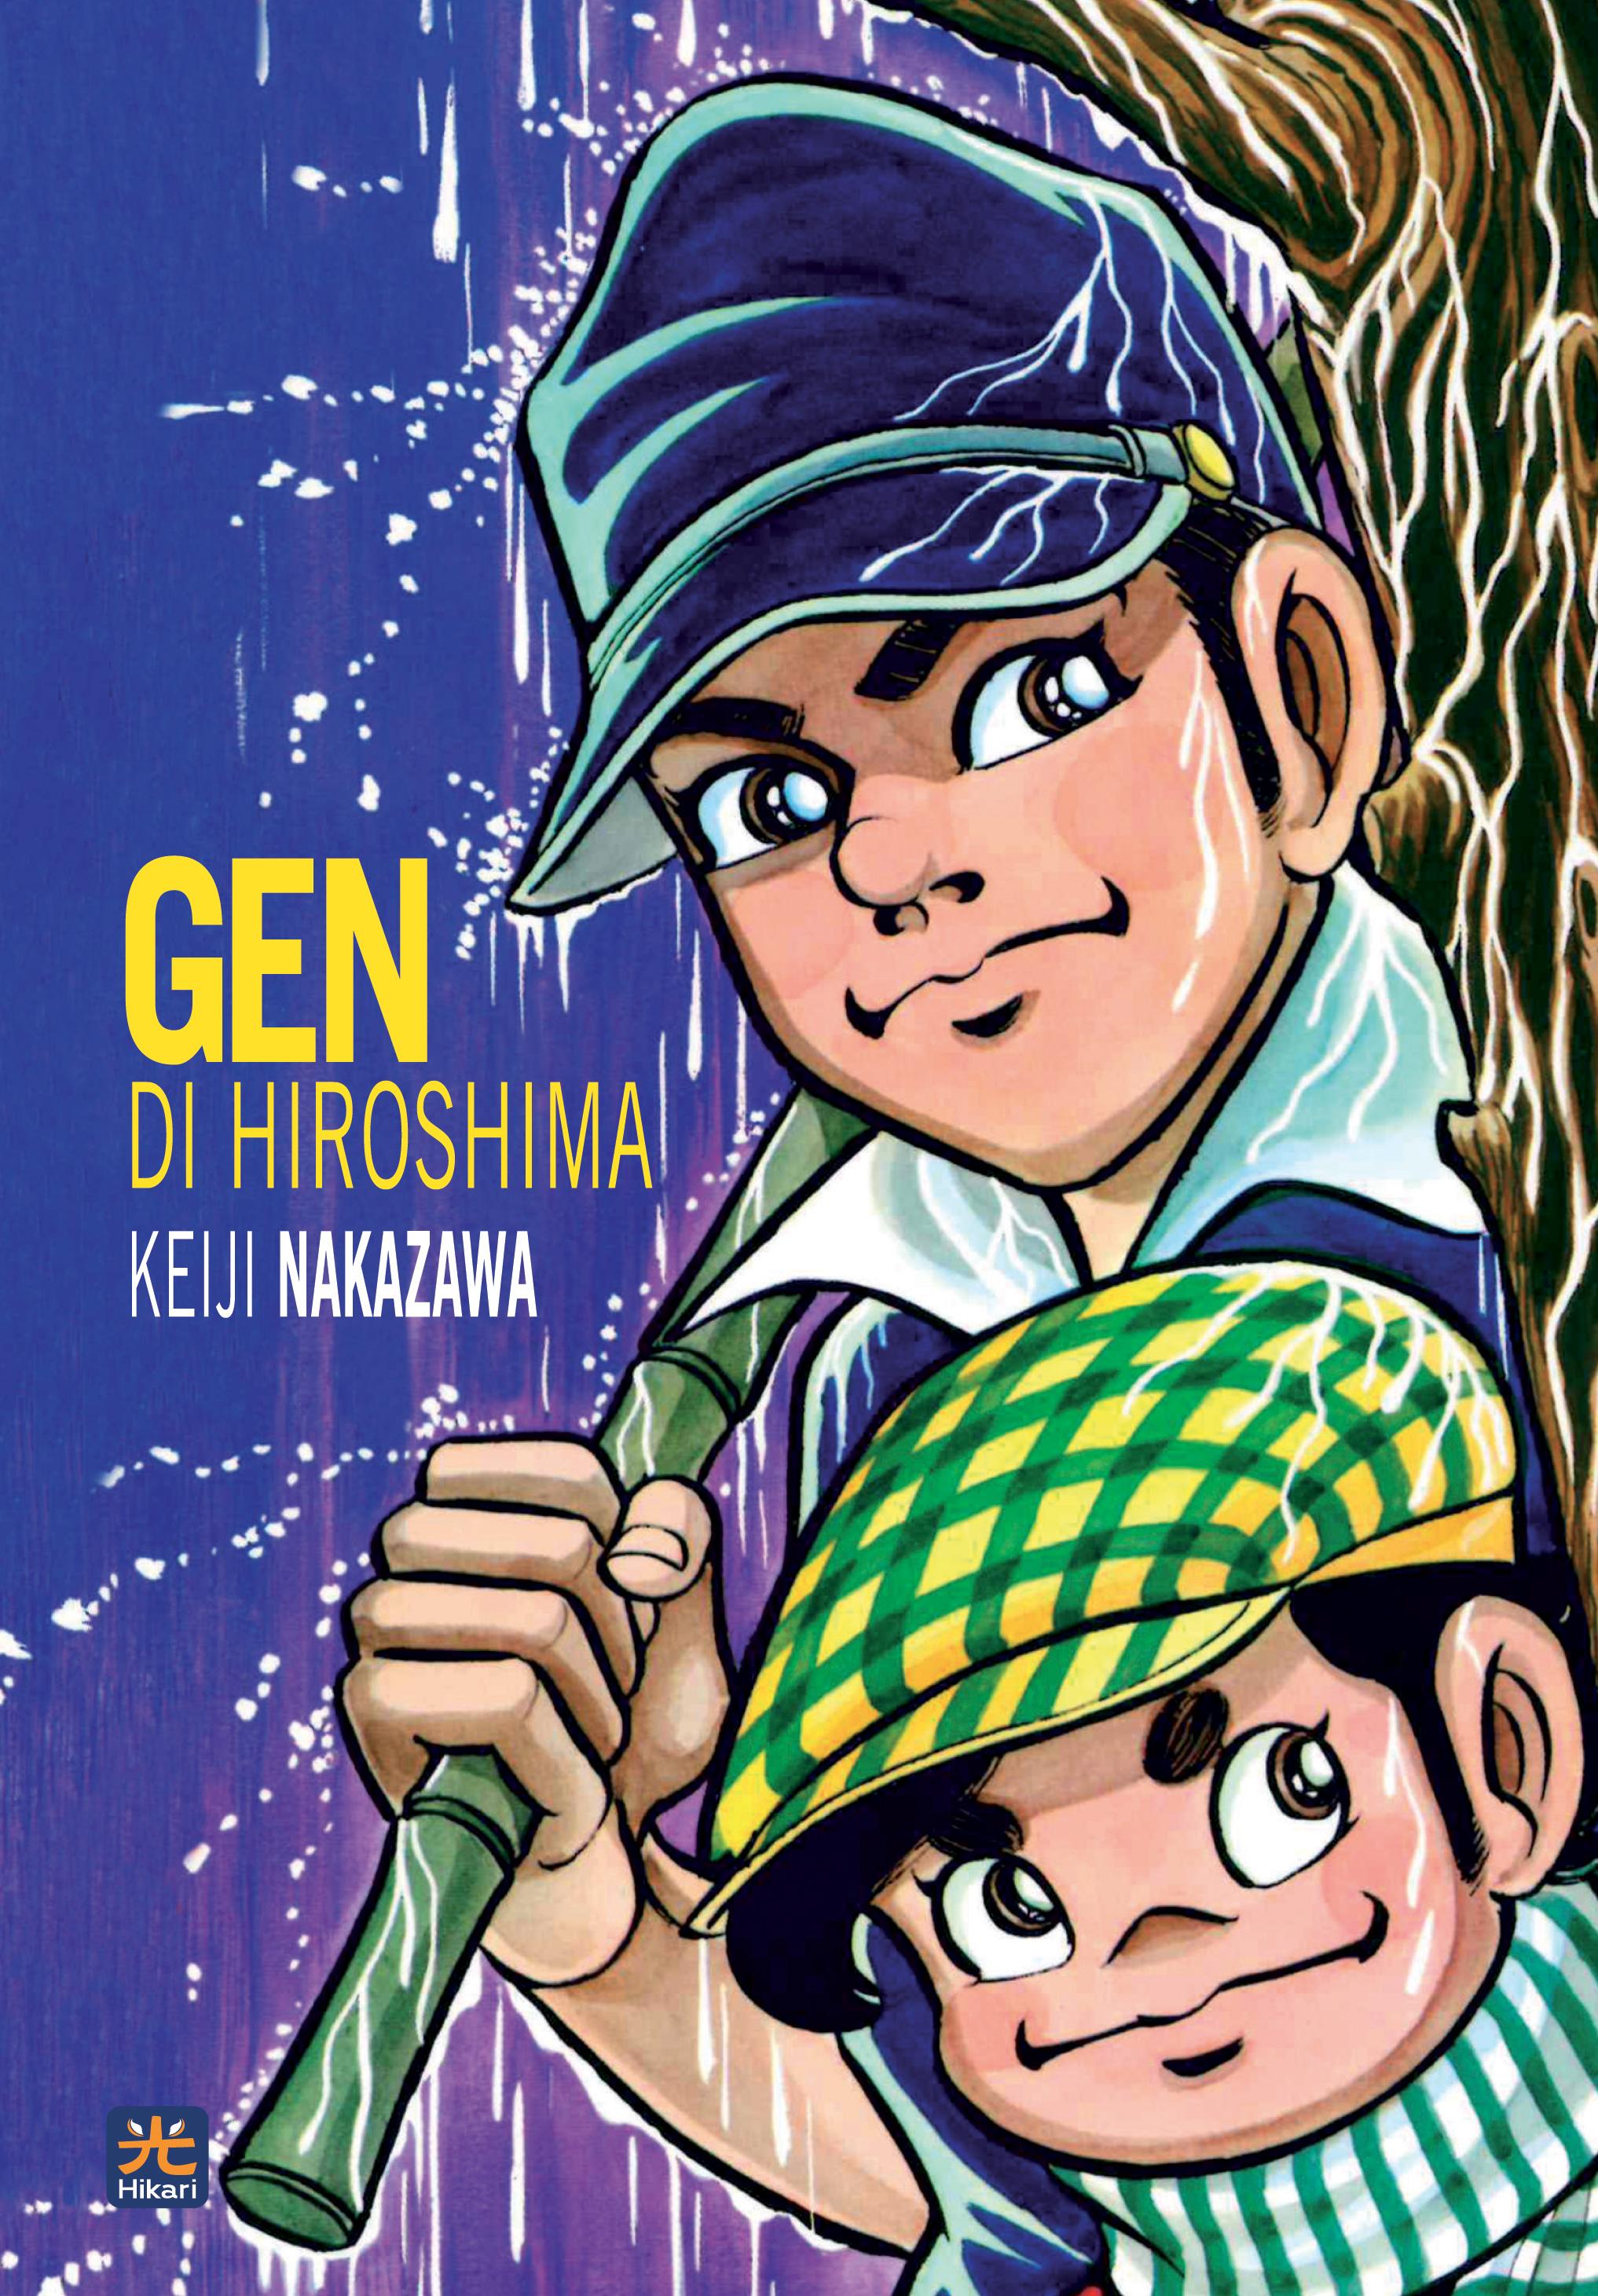 Gen di Hiroshima vol. 2 (di 3) (versione regular)